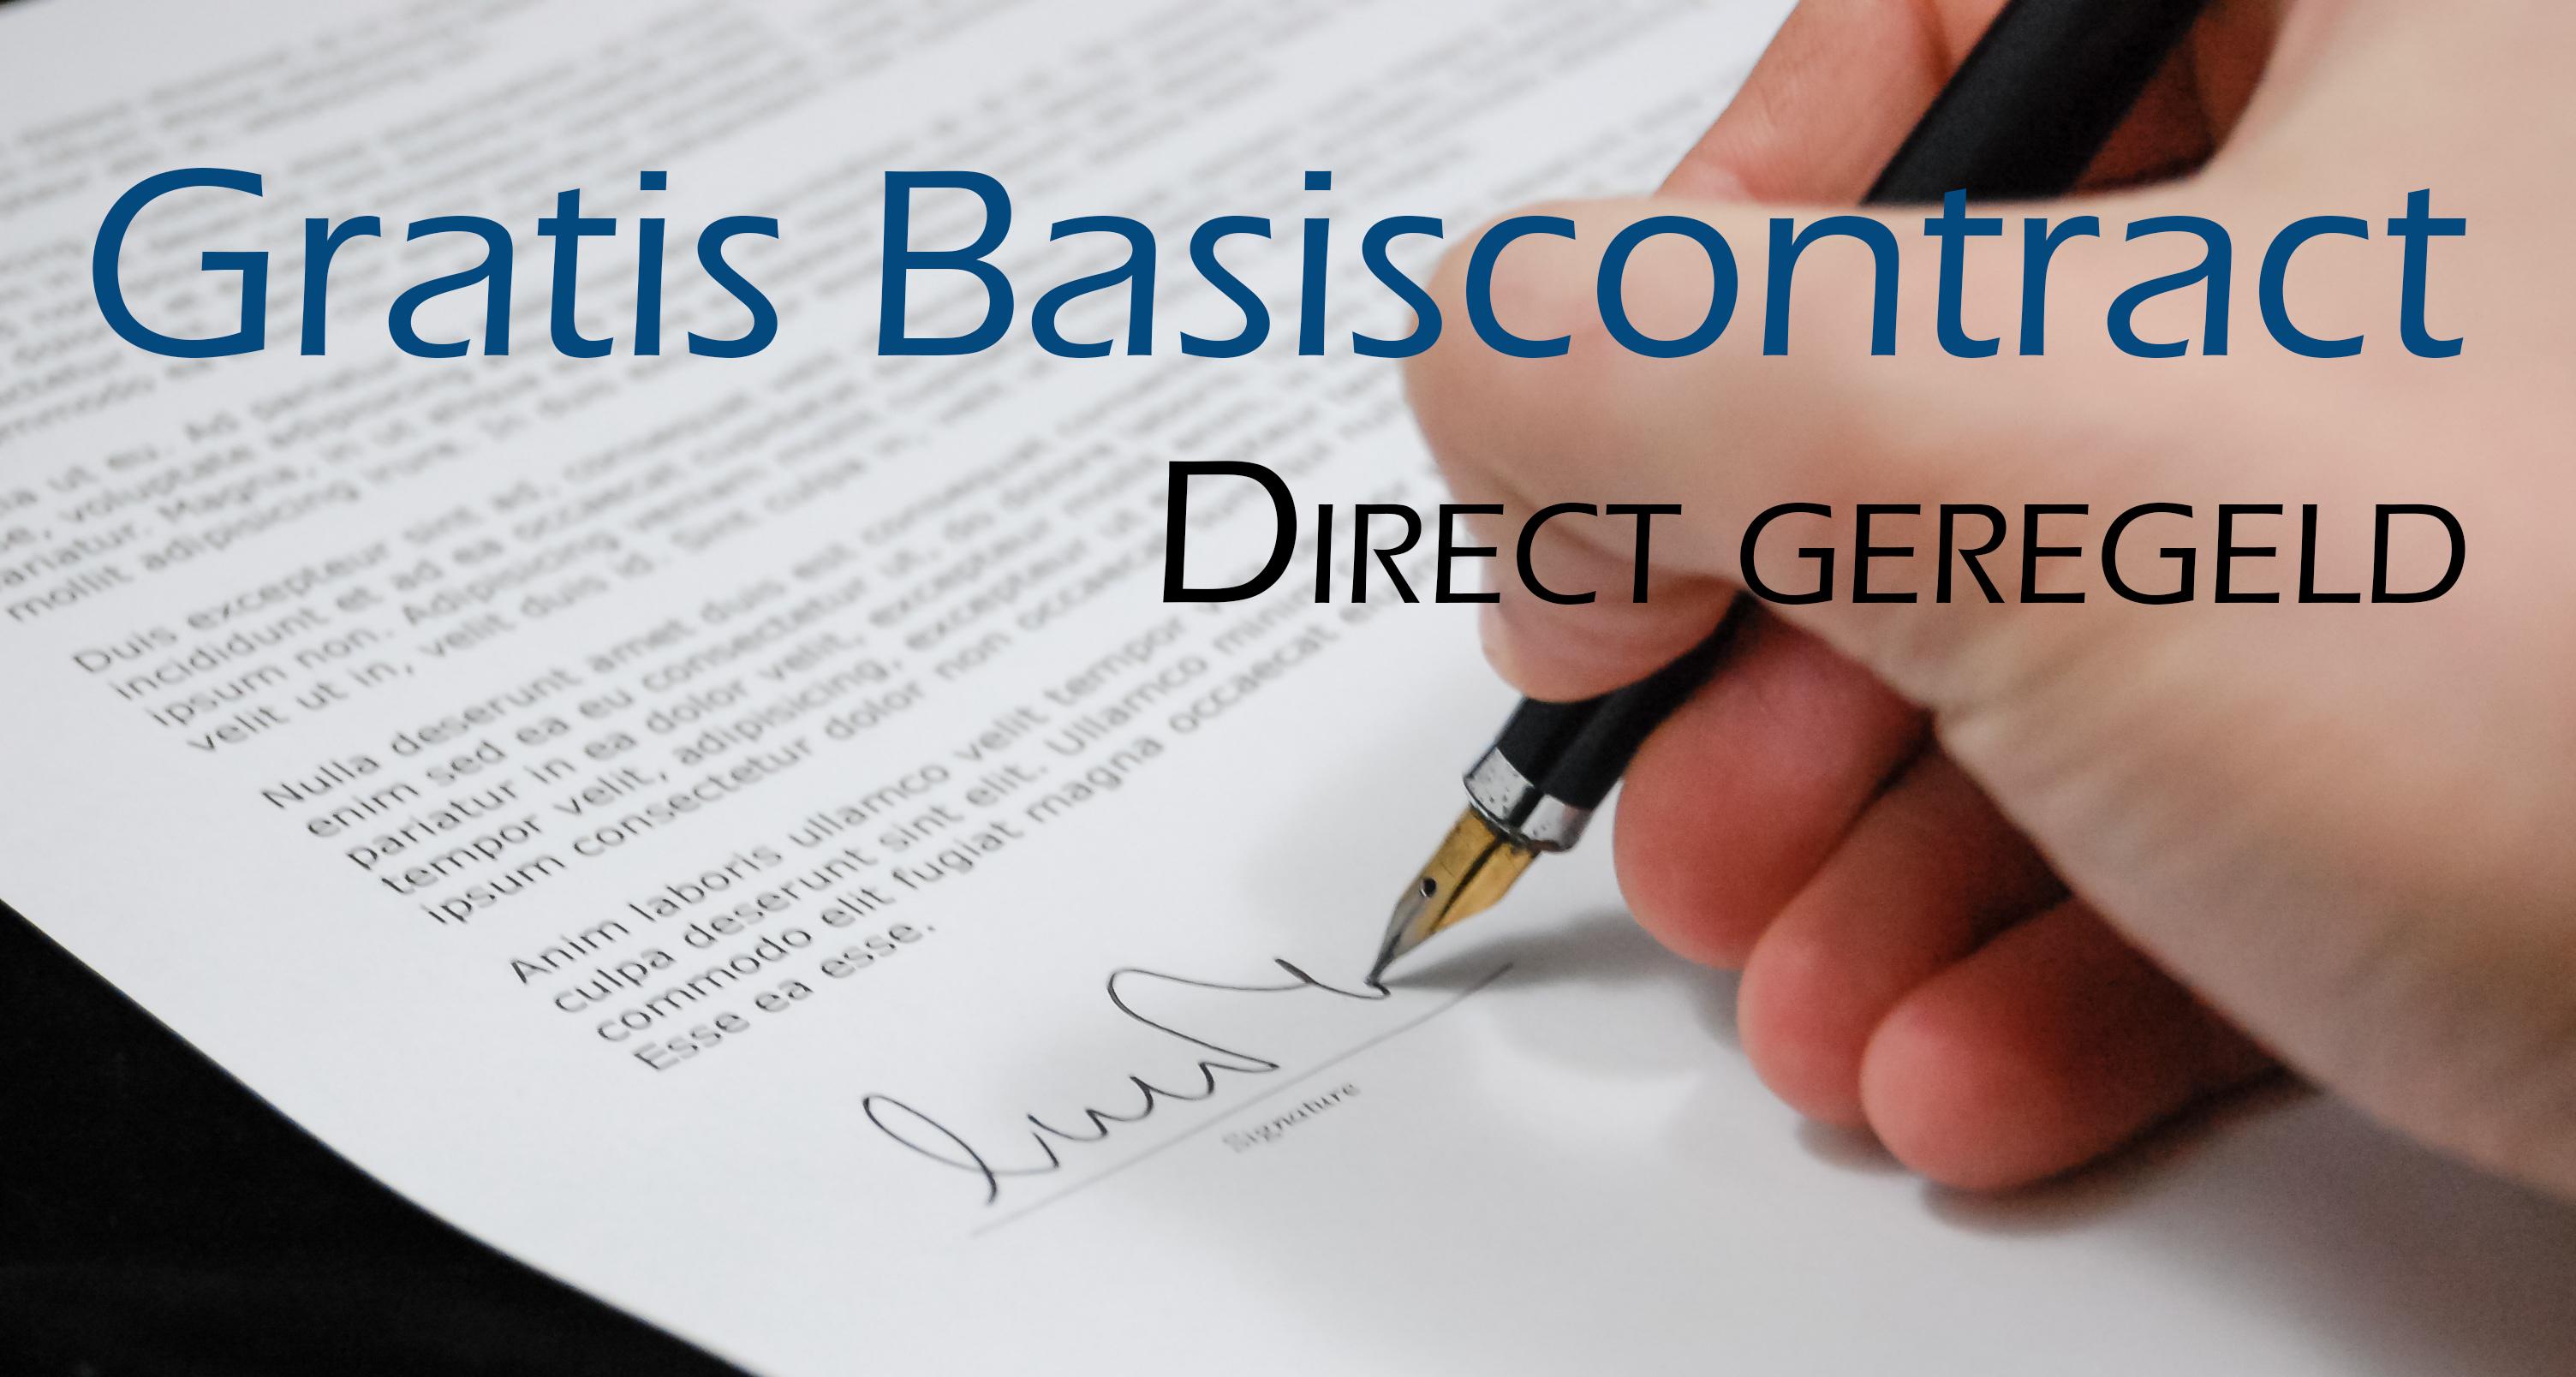 Gratis Basiscontract